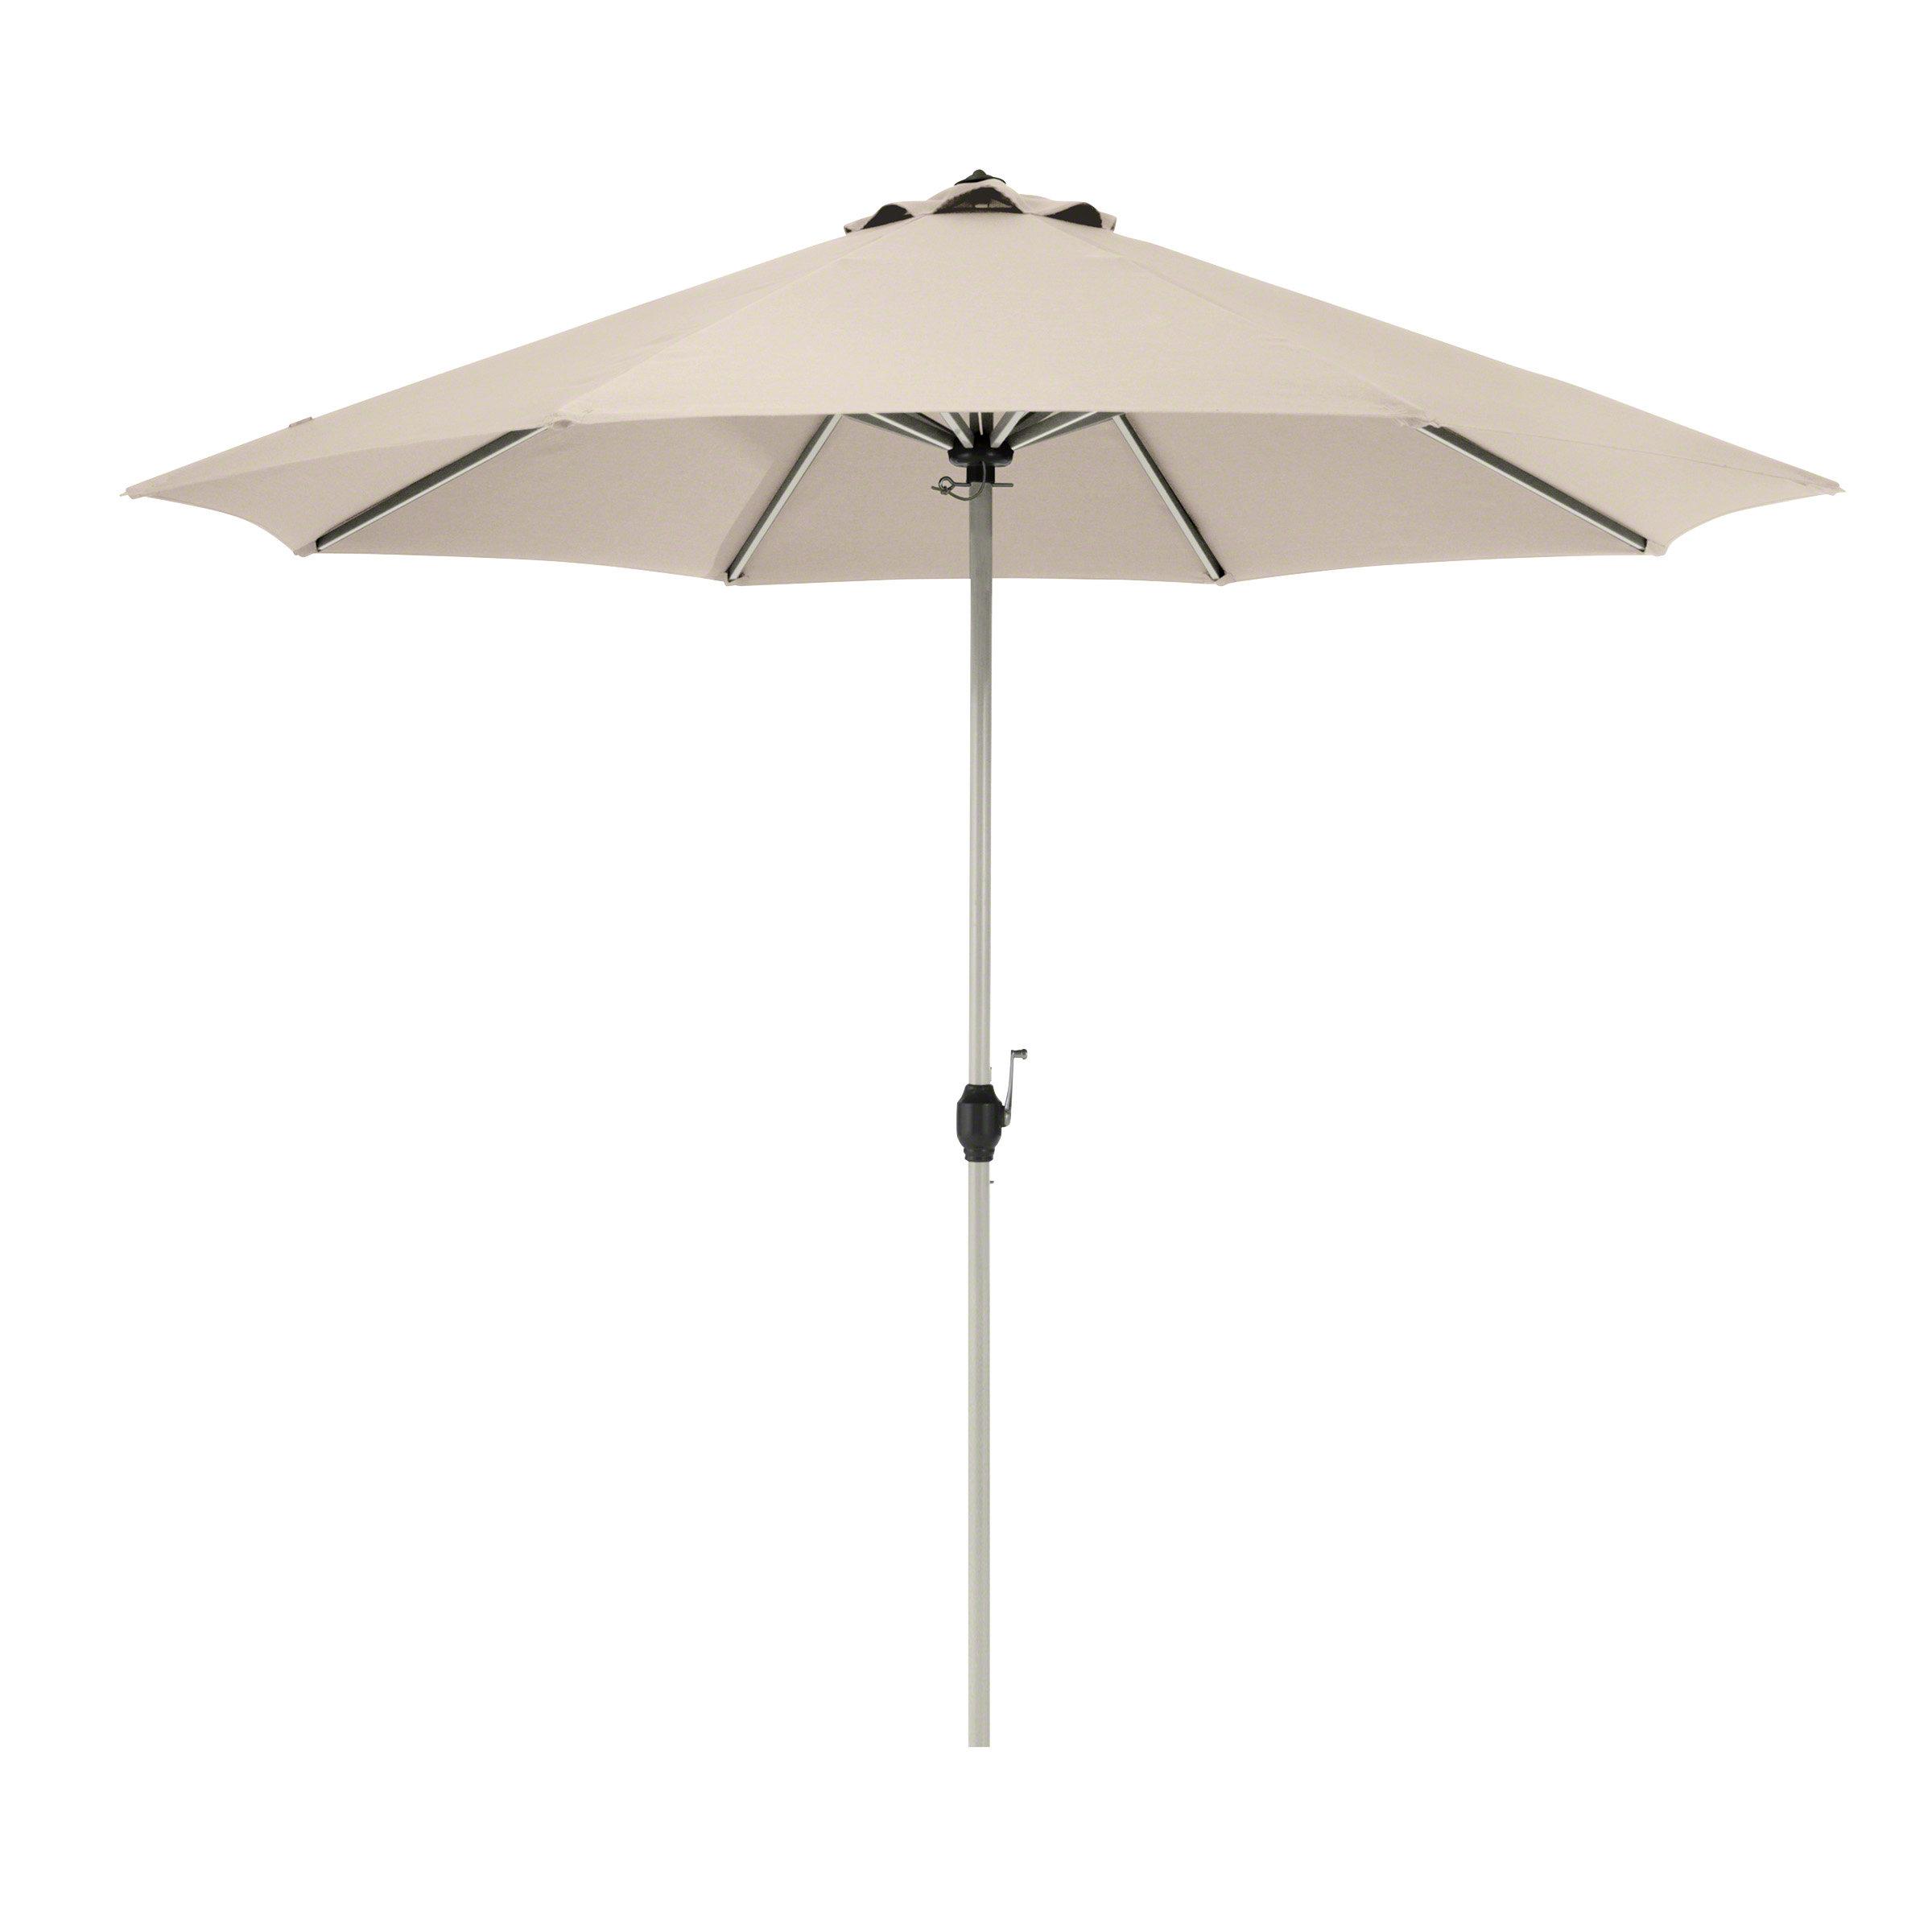 Newest Cannock Market Umbrellas Inside Searcy Fadesafe™ 9' Market Umbrella (View 18 of 20)